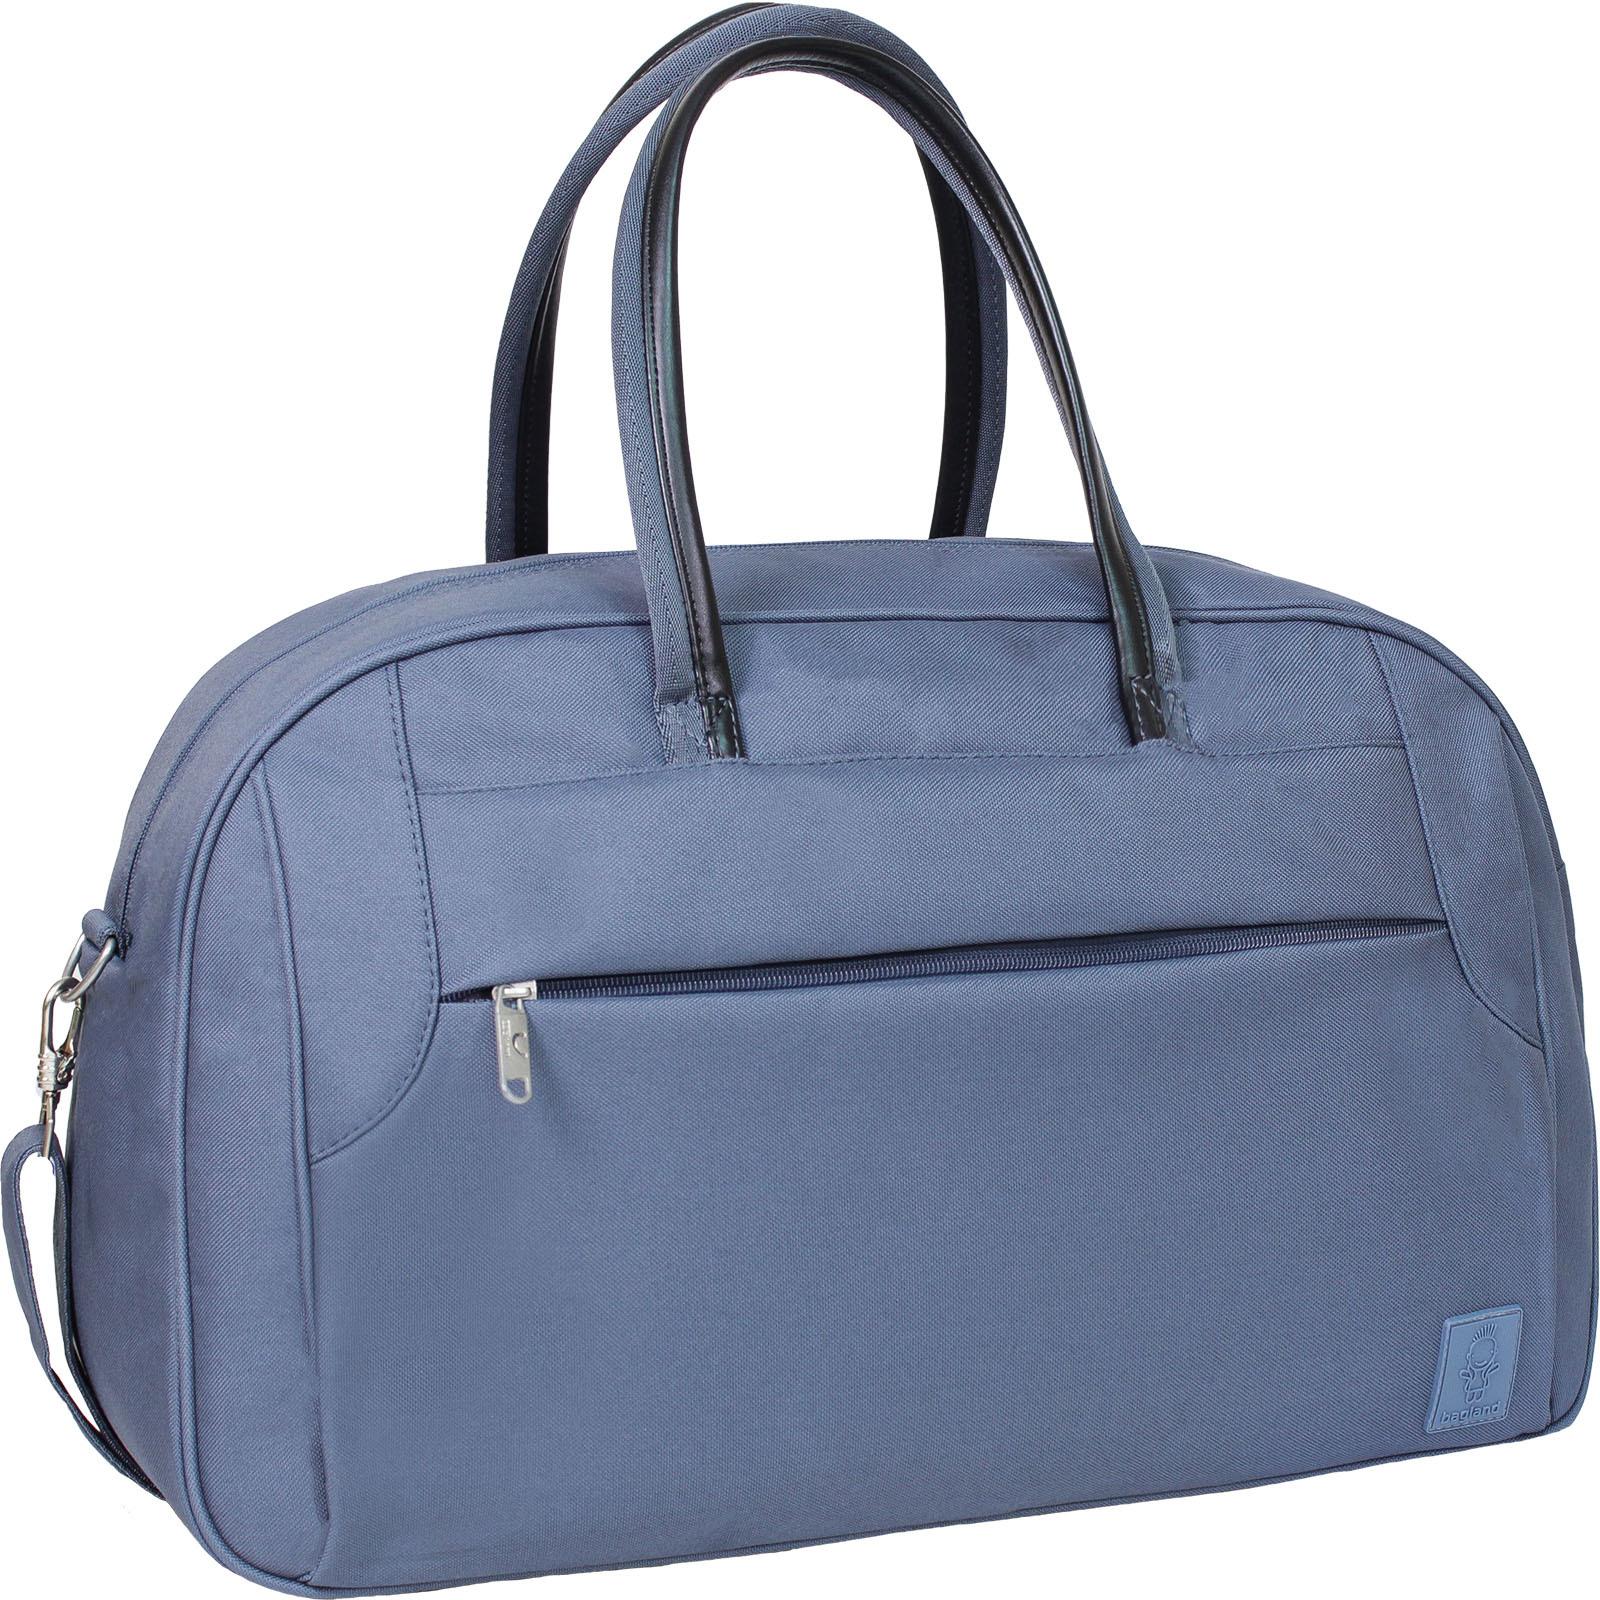 Спортивные сумки Сумка Bagland Тунис 34 л. Темно серый (0039066) IMG_8944-1600.jpg